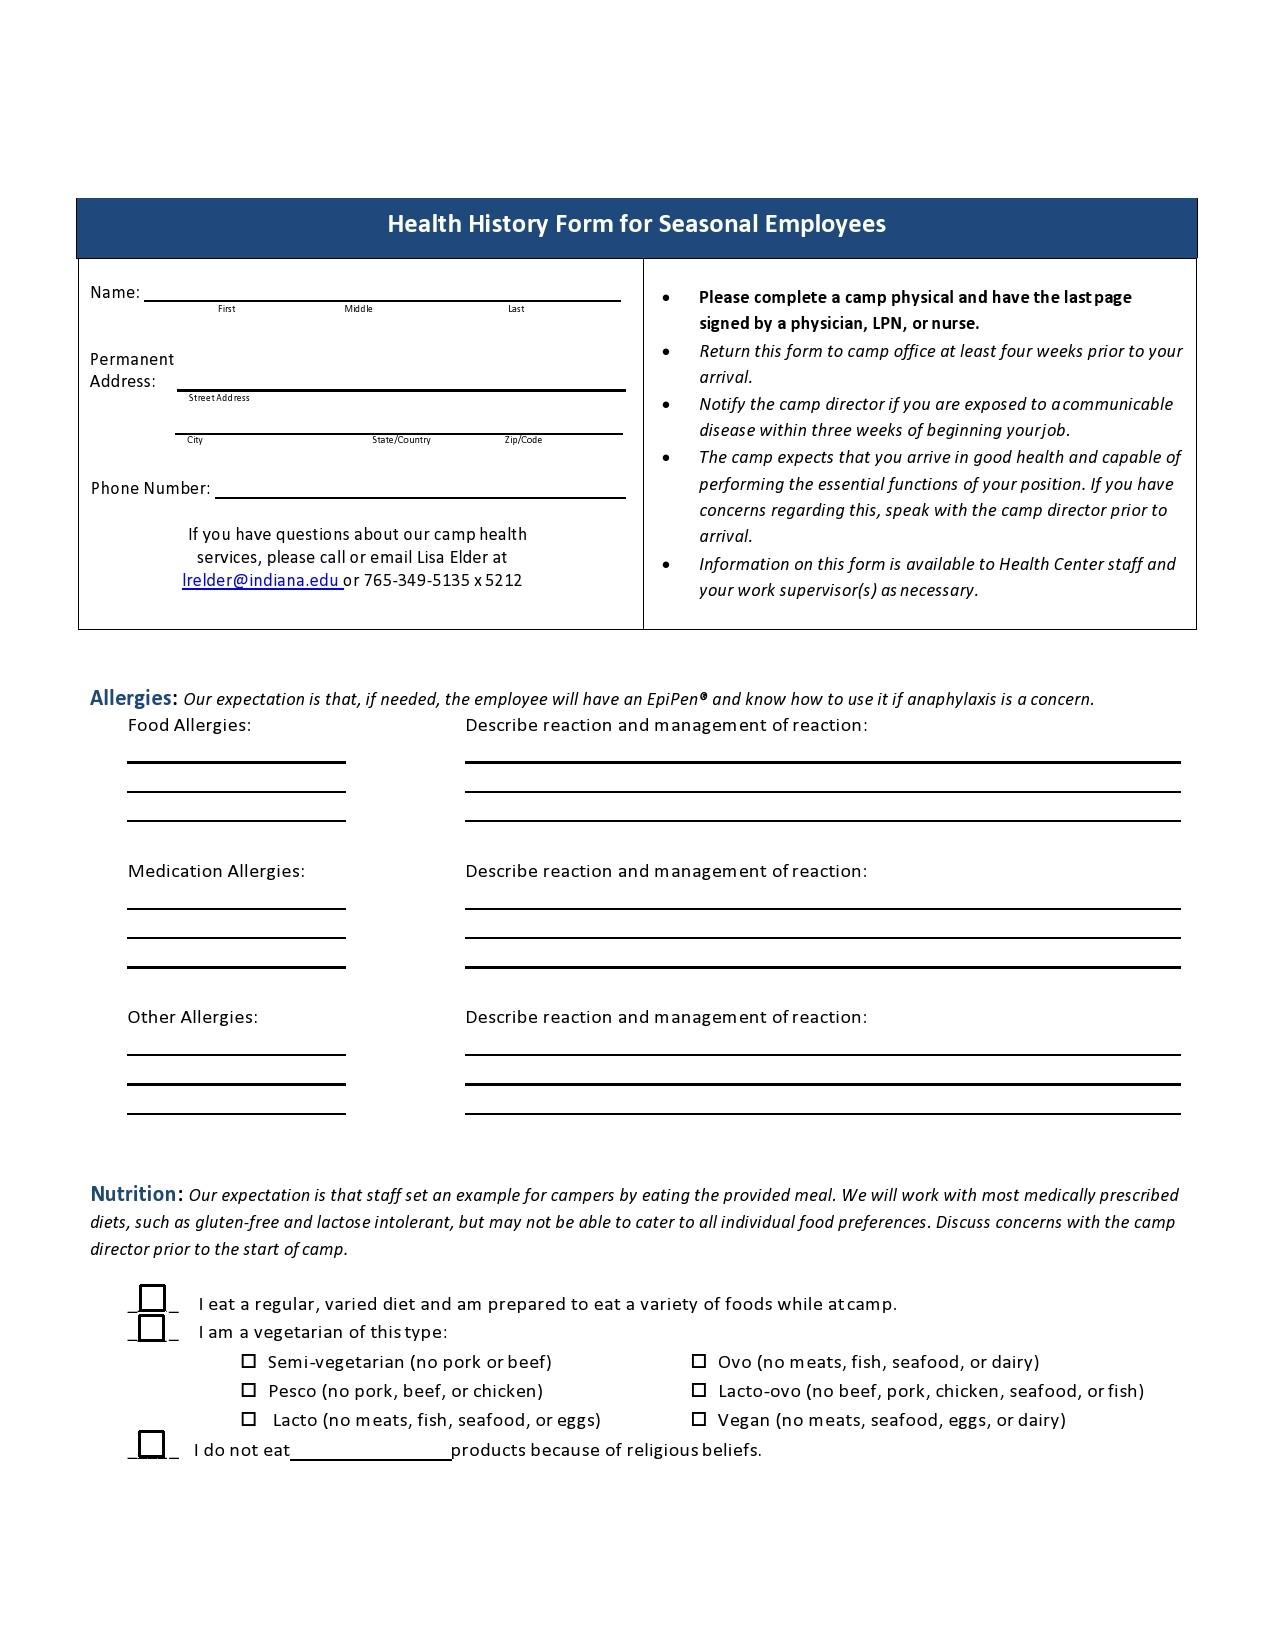 Free health history form 17